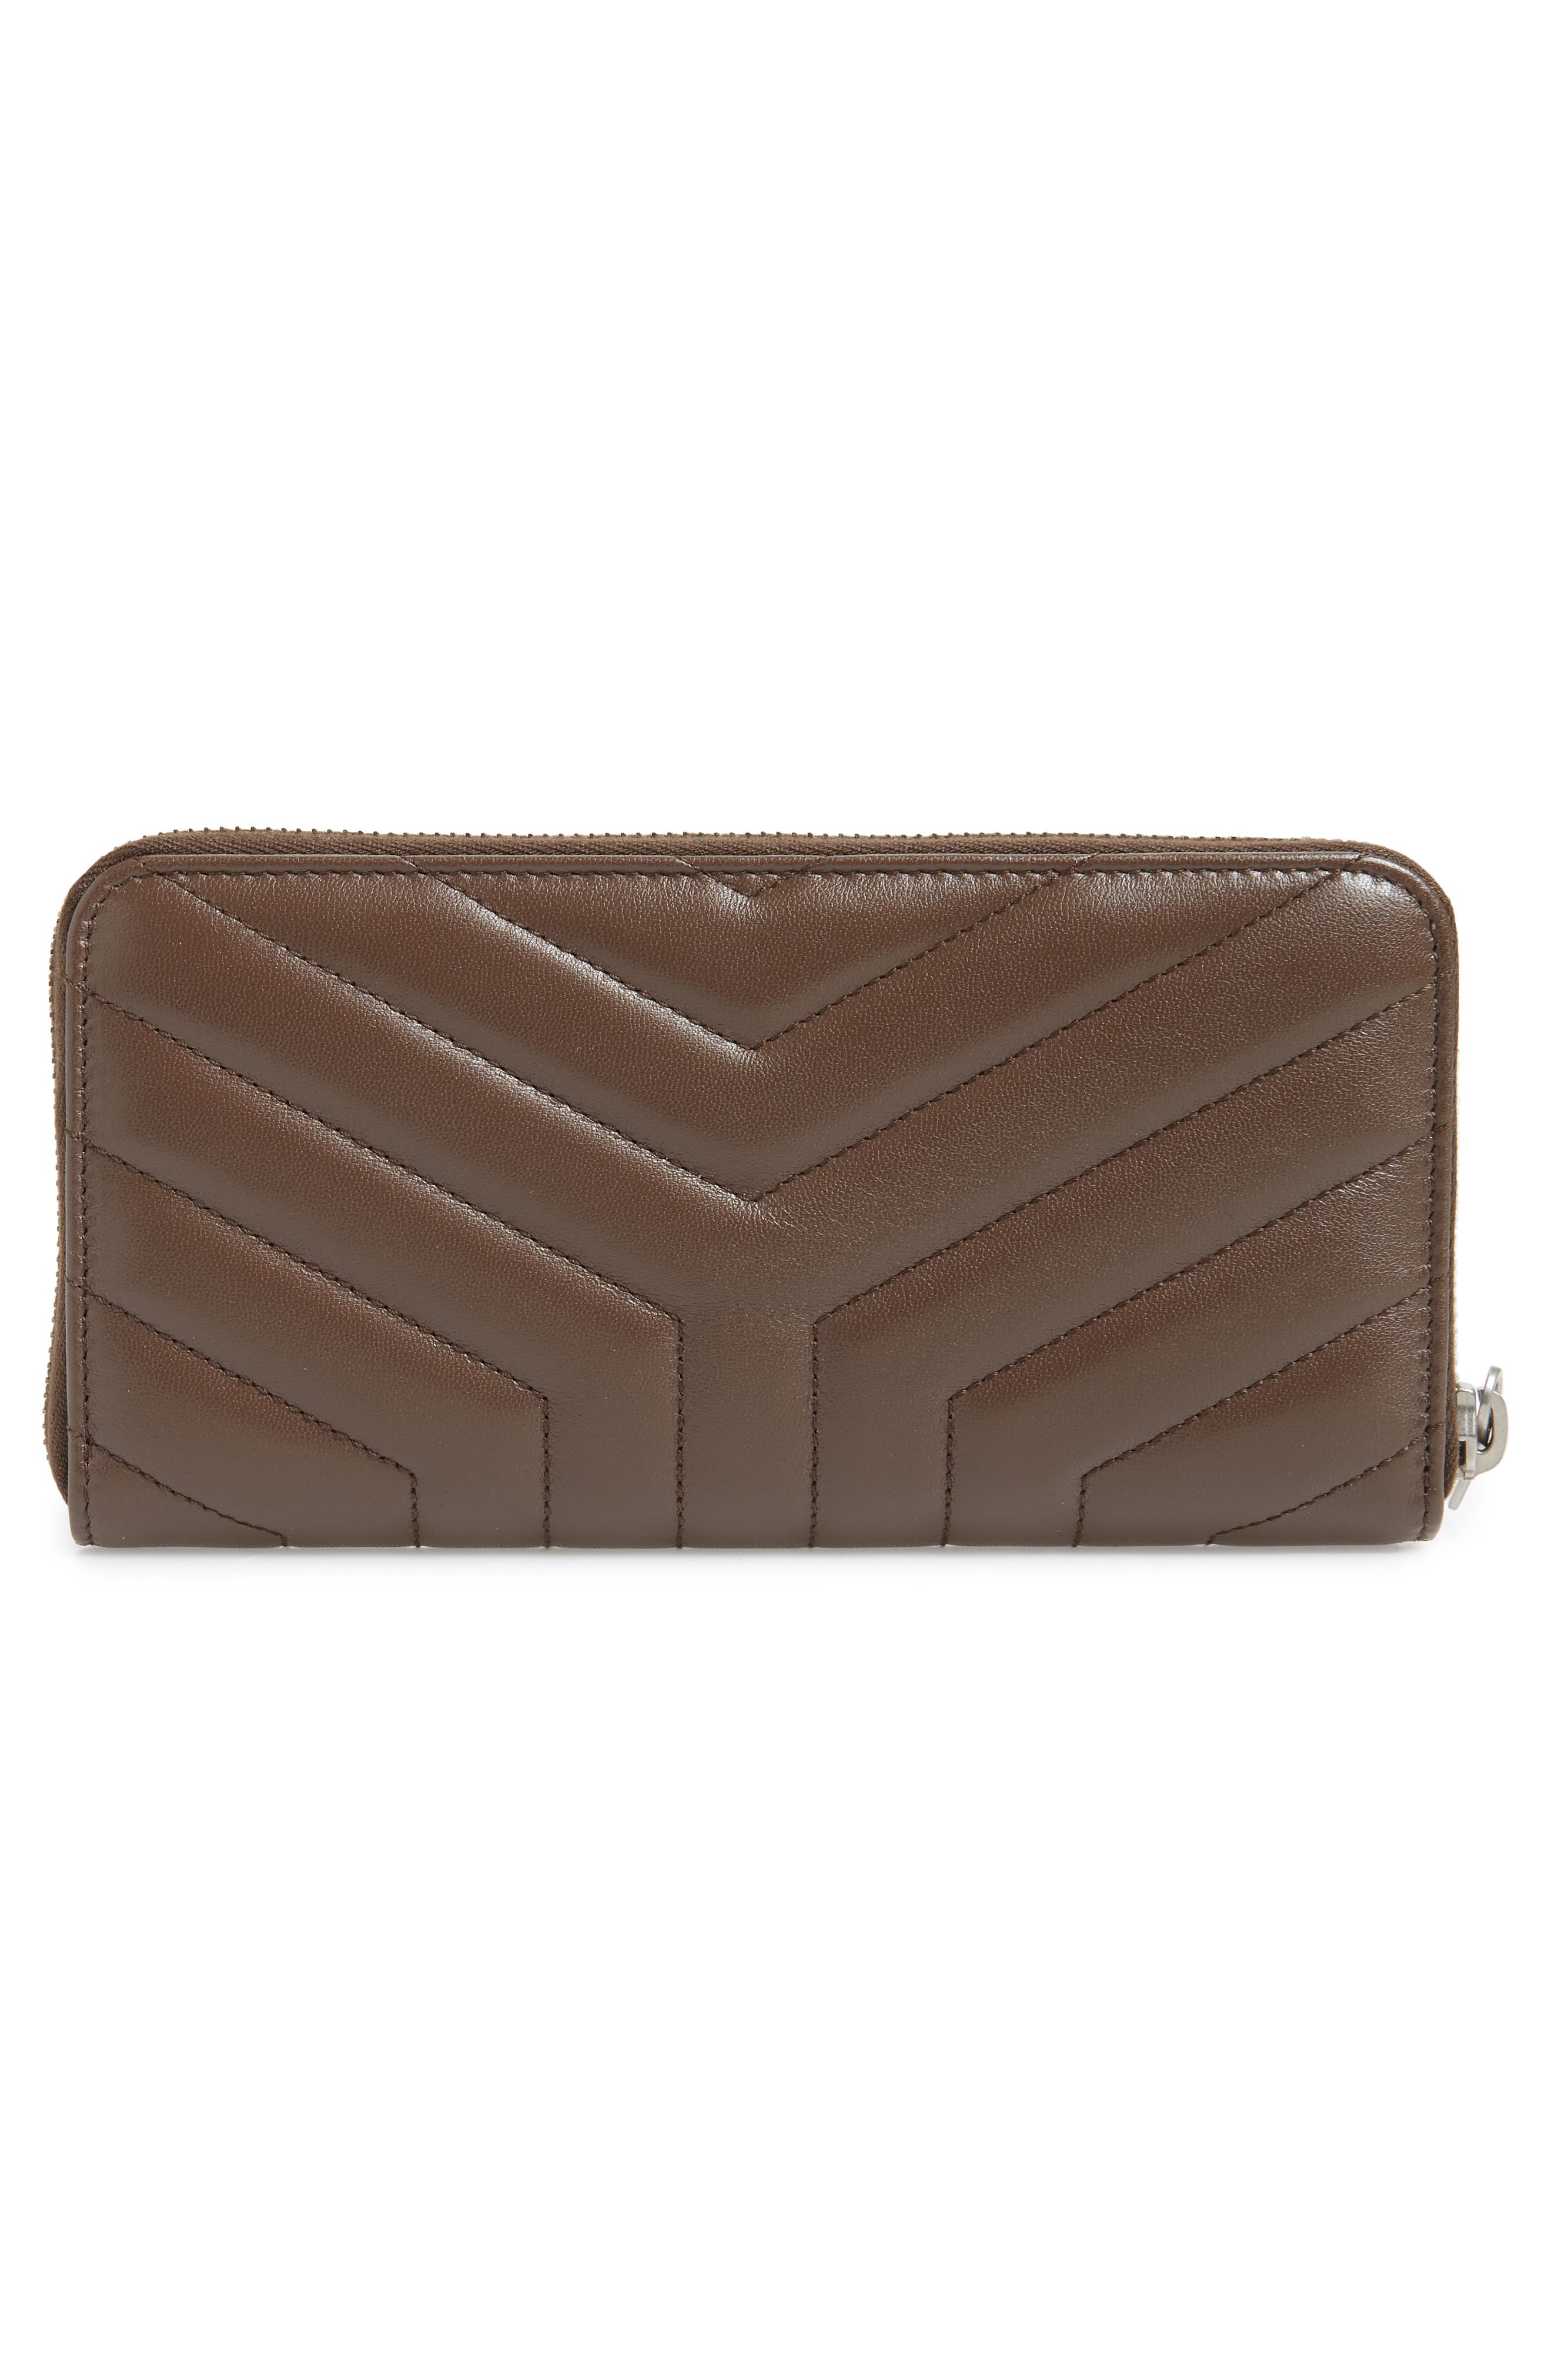 Loulou Matelassé Leather Zip-Around Wallet,                             Alternate thumbnail 3, color,                             FAGGIO